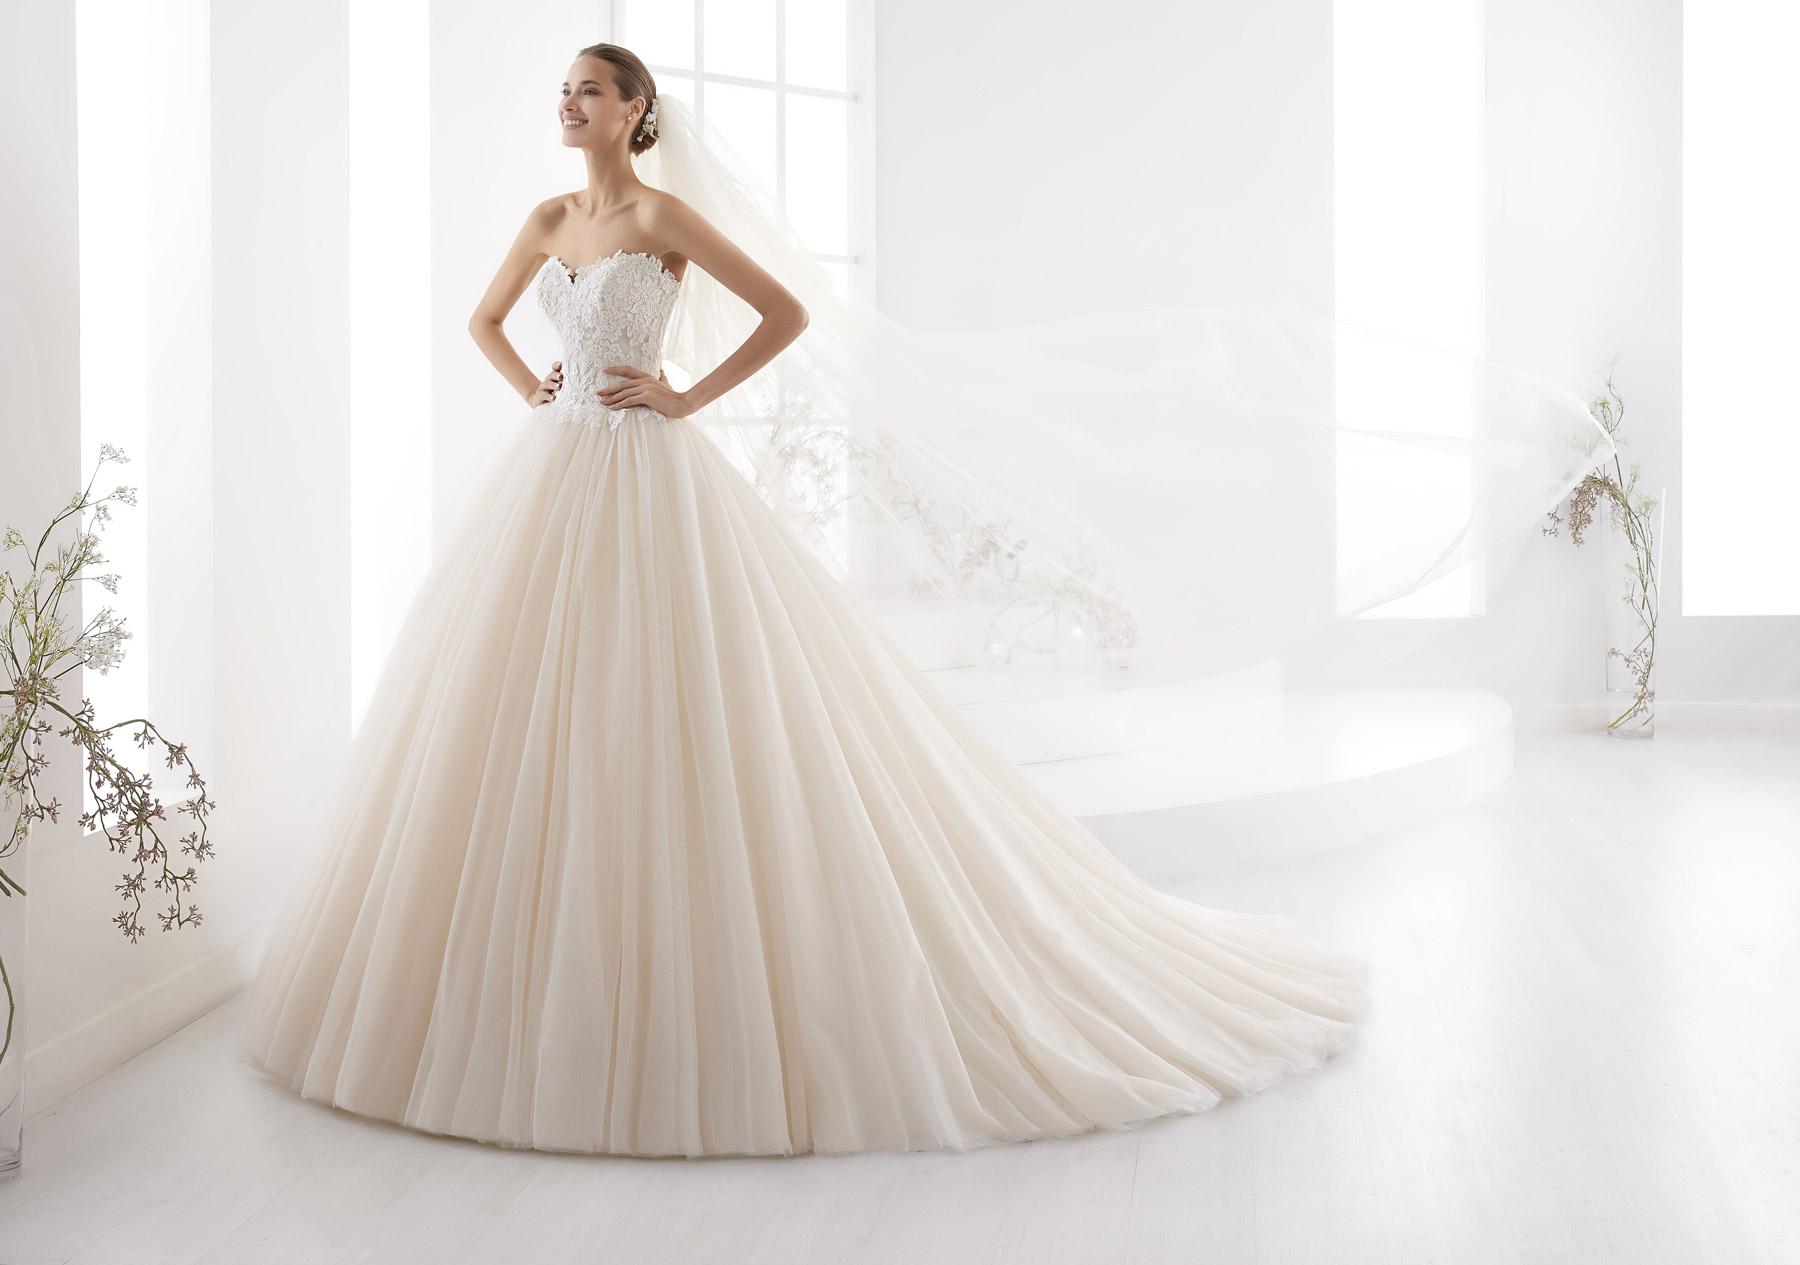 7966842523a0 Abito da Sposa AUAB18919 Aurora Nicole - Stefania Spose Parma